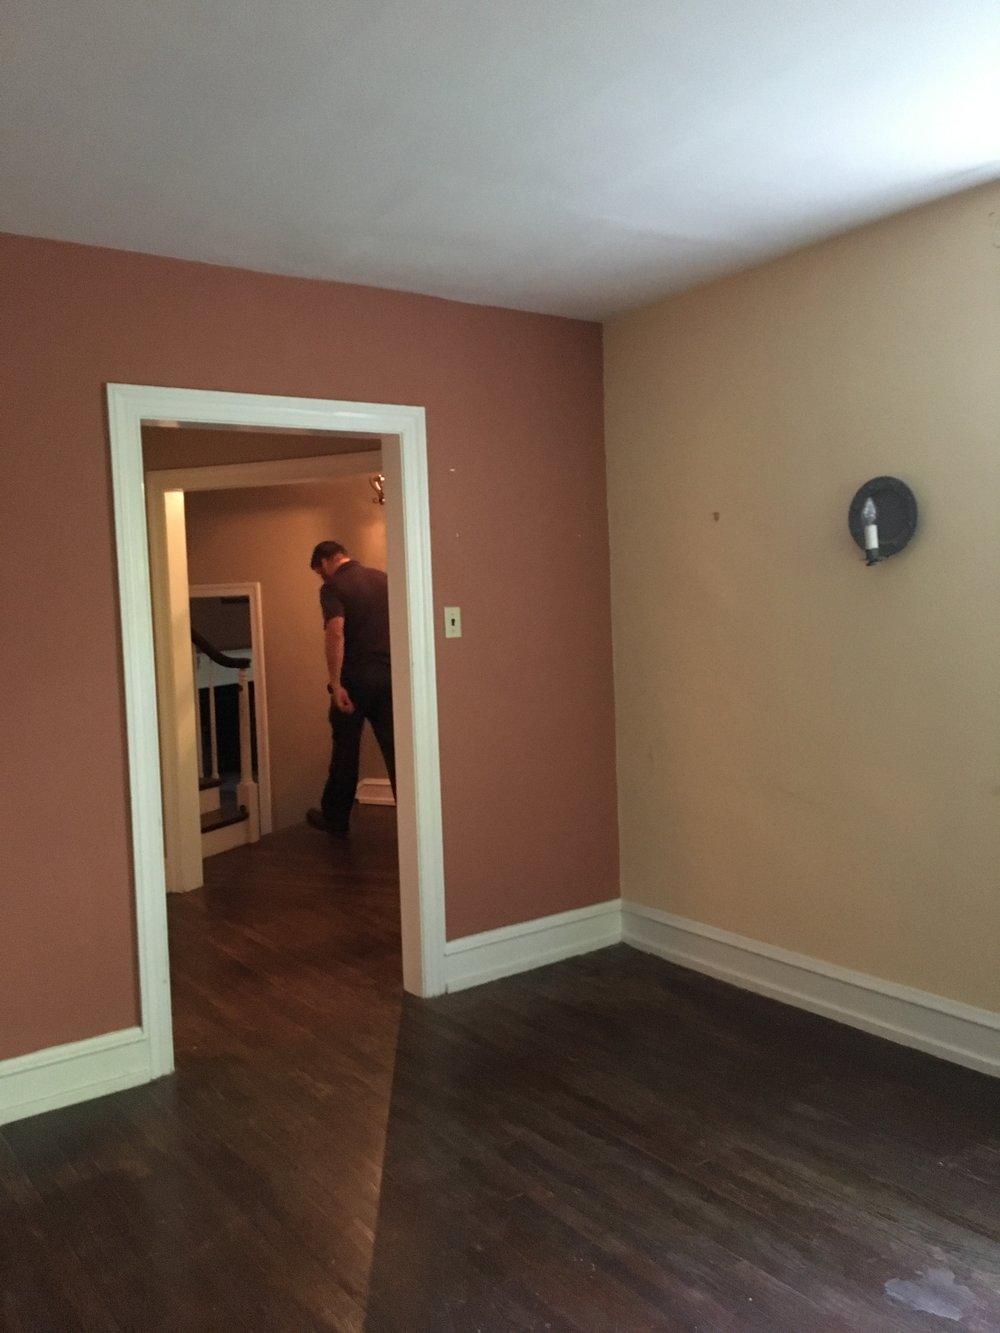 Michelle Gage // One Room Challenge: Week 1